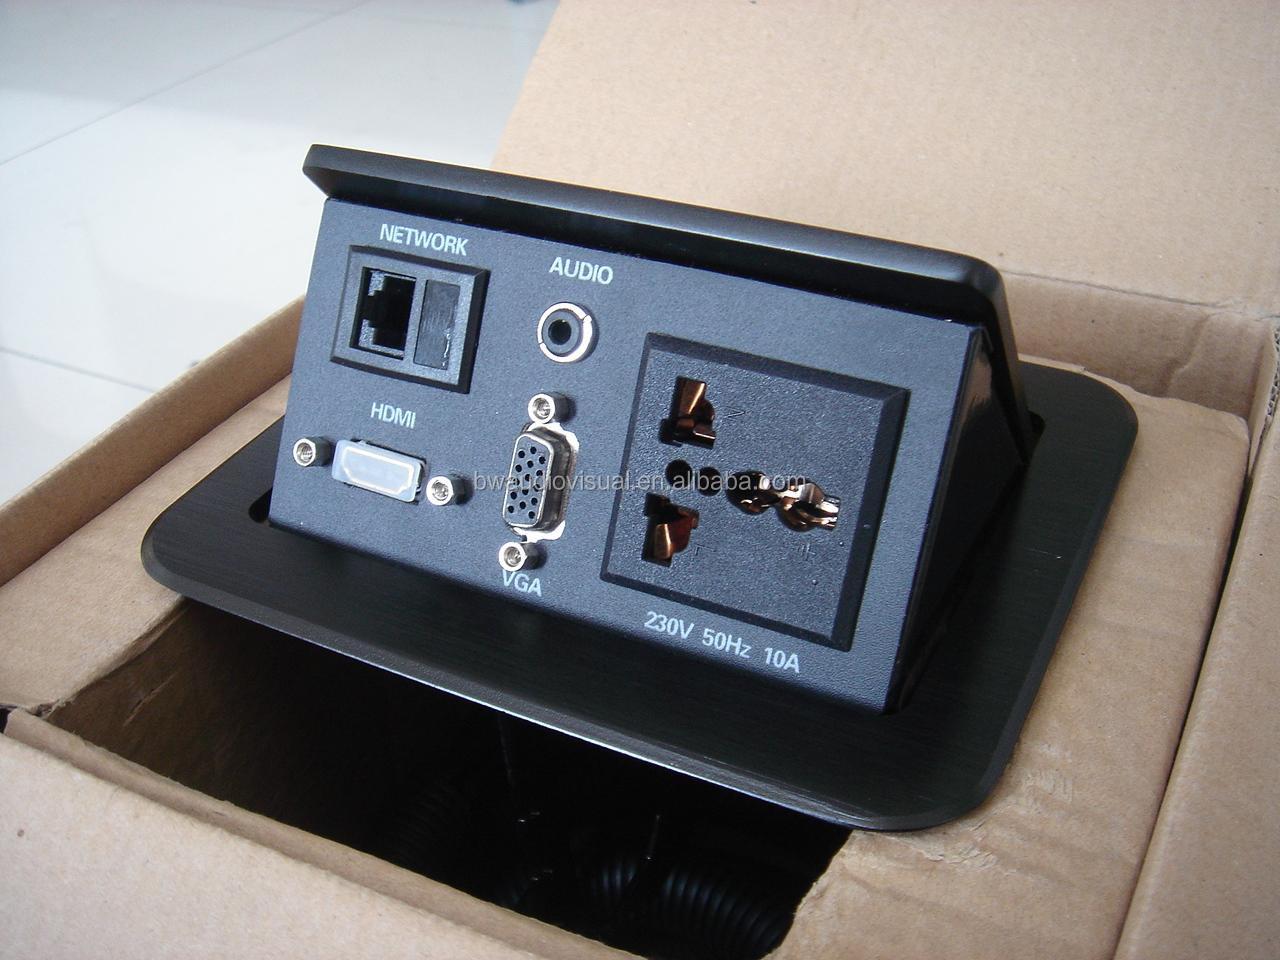 Multimedia Pop Up Socket Outlet For Data And Aluminum Tabletop Desk Box